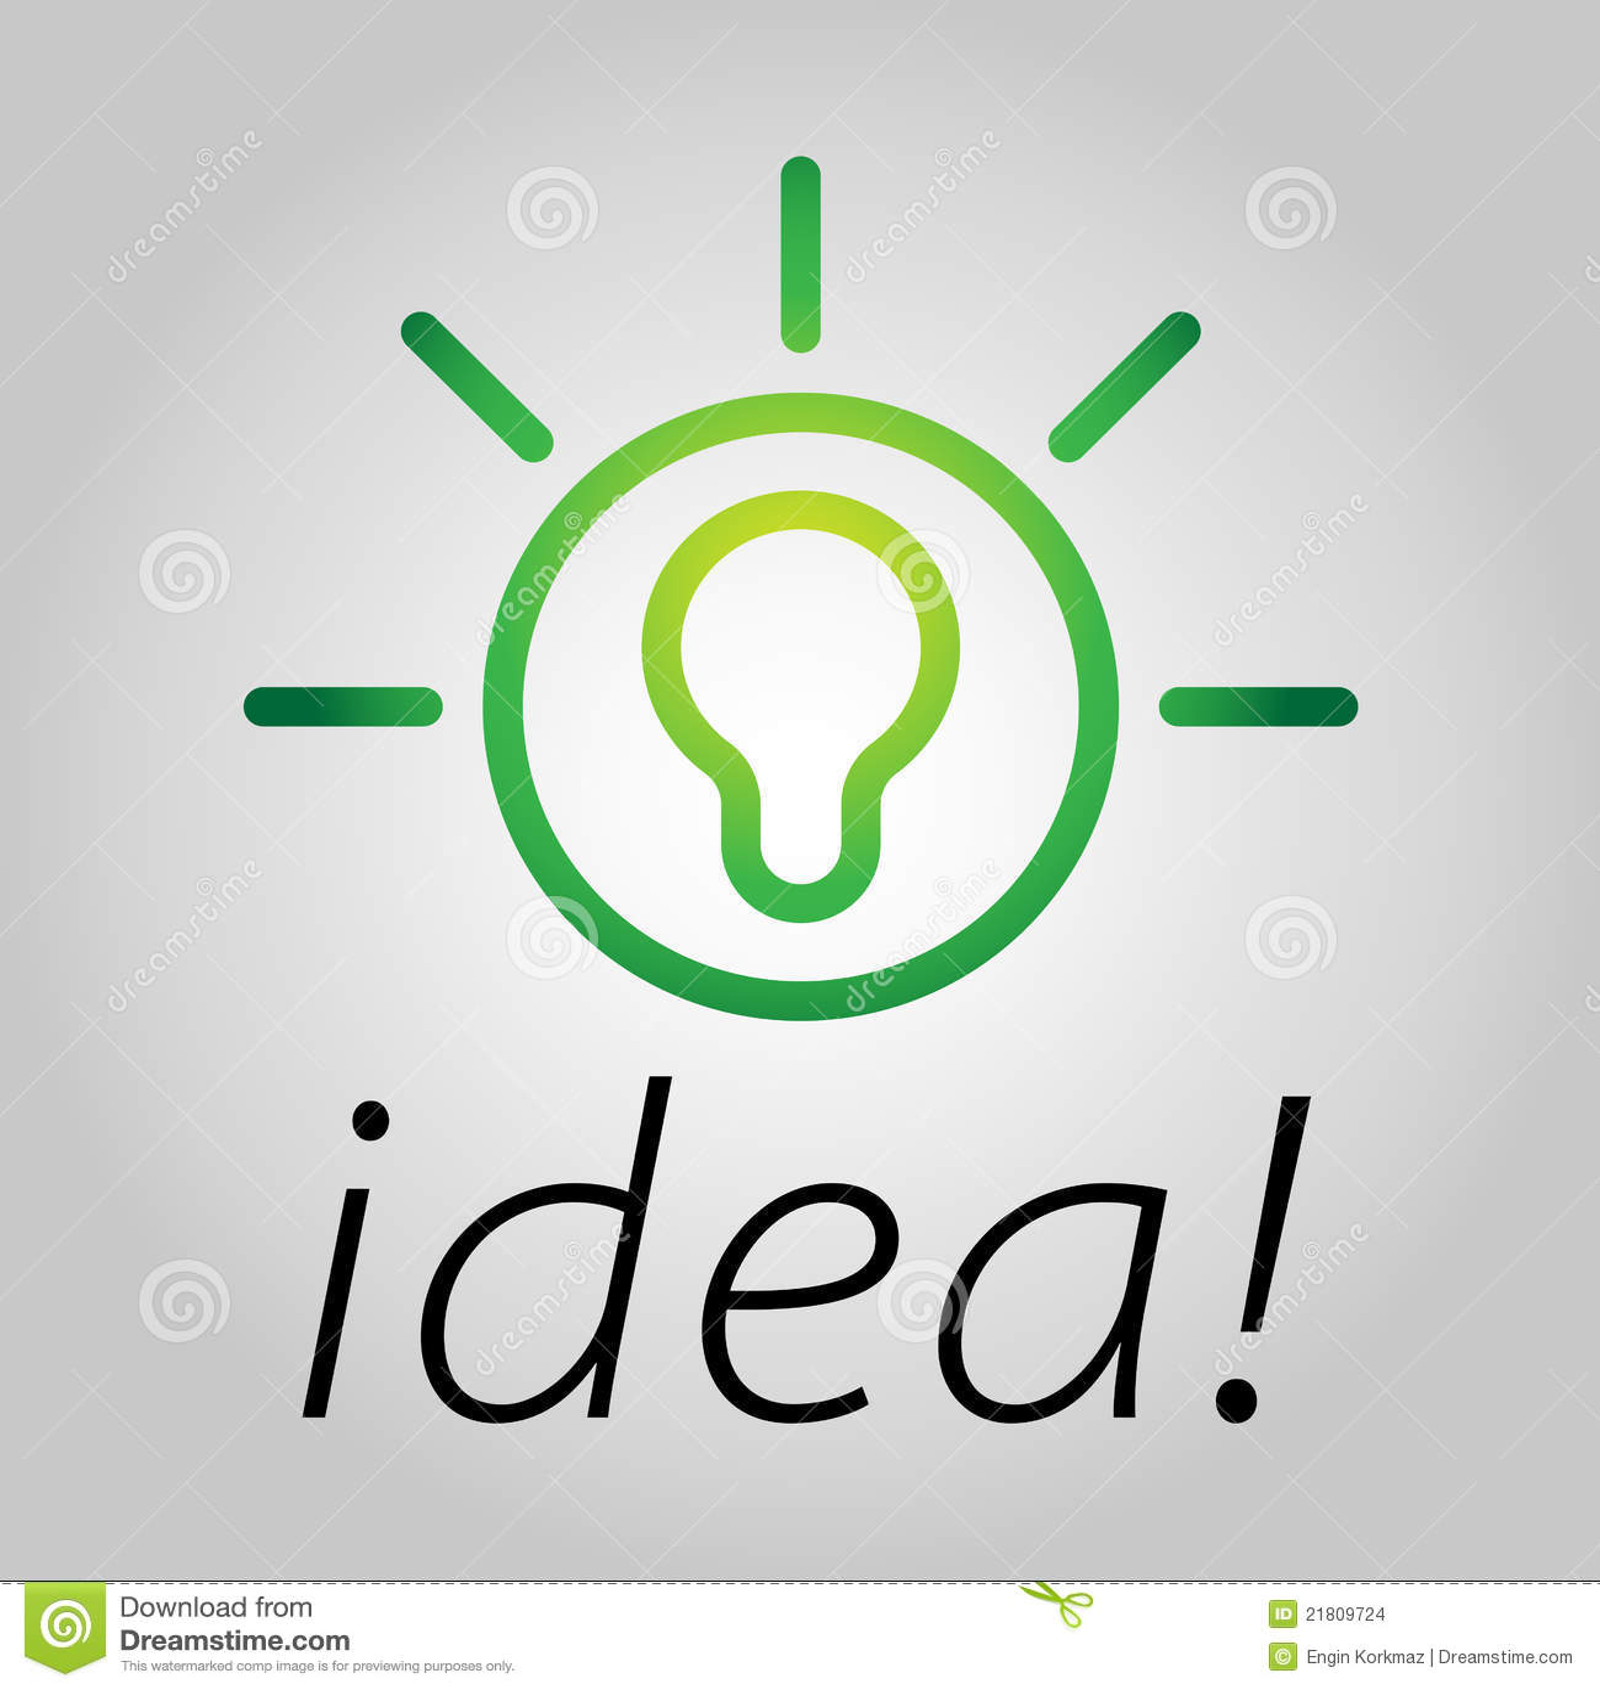 Modern Bulb Icon Symbolizing Bright Ideas In A Simple Form